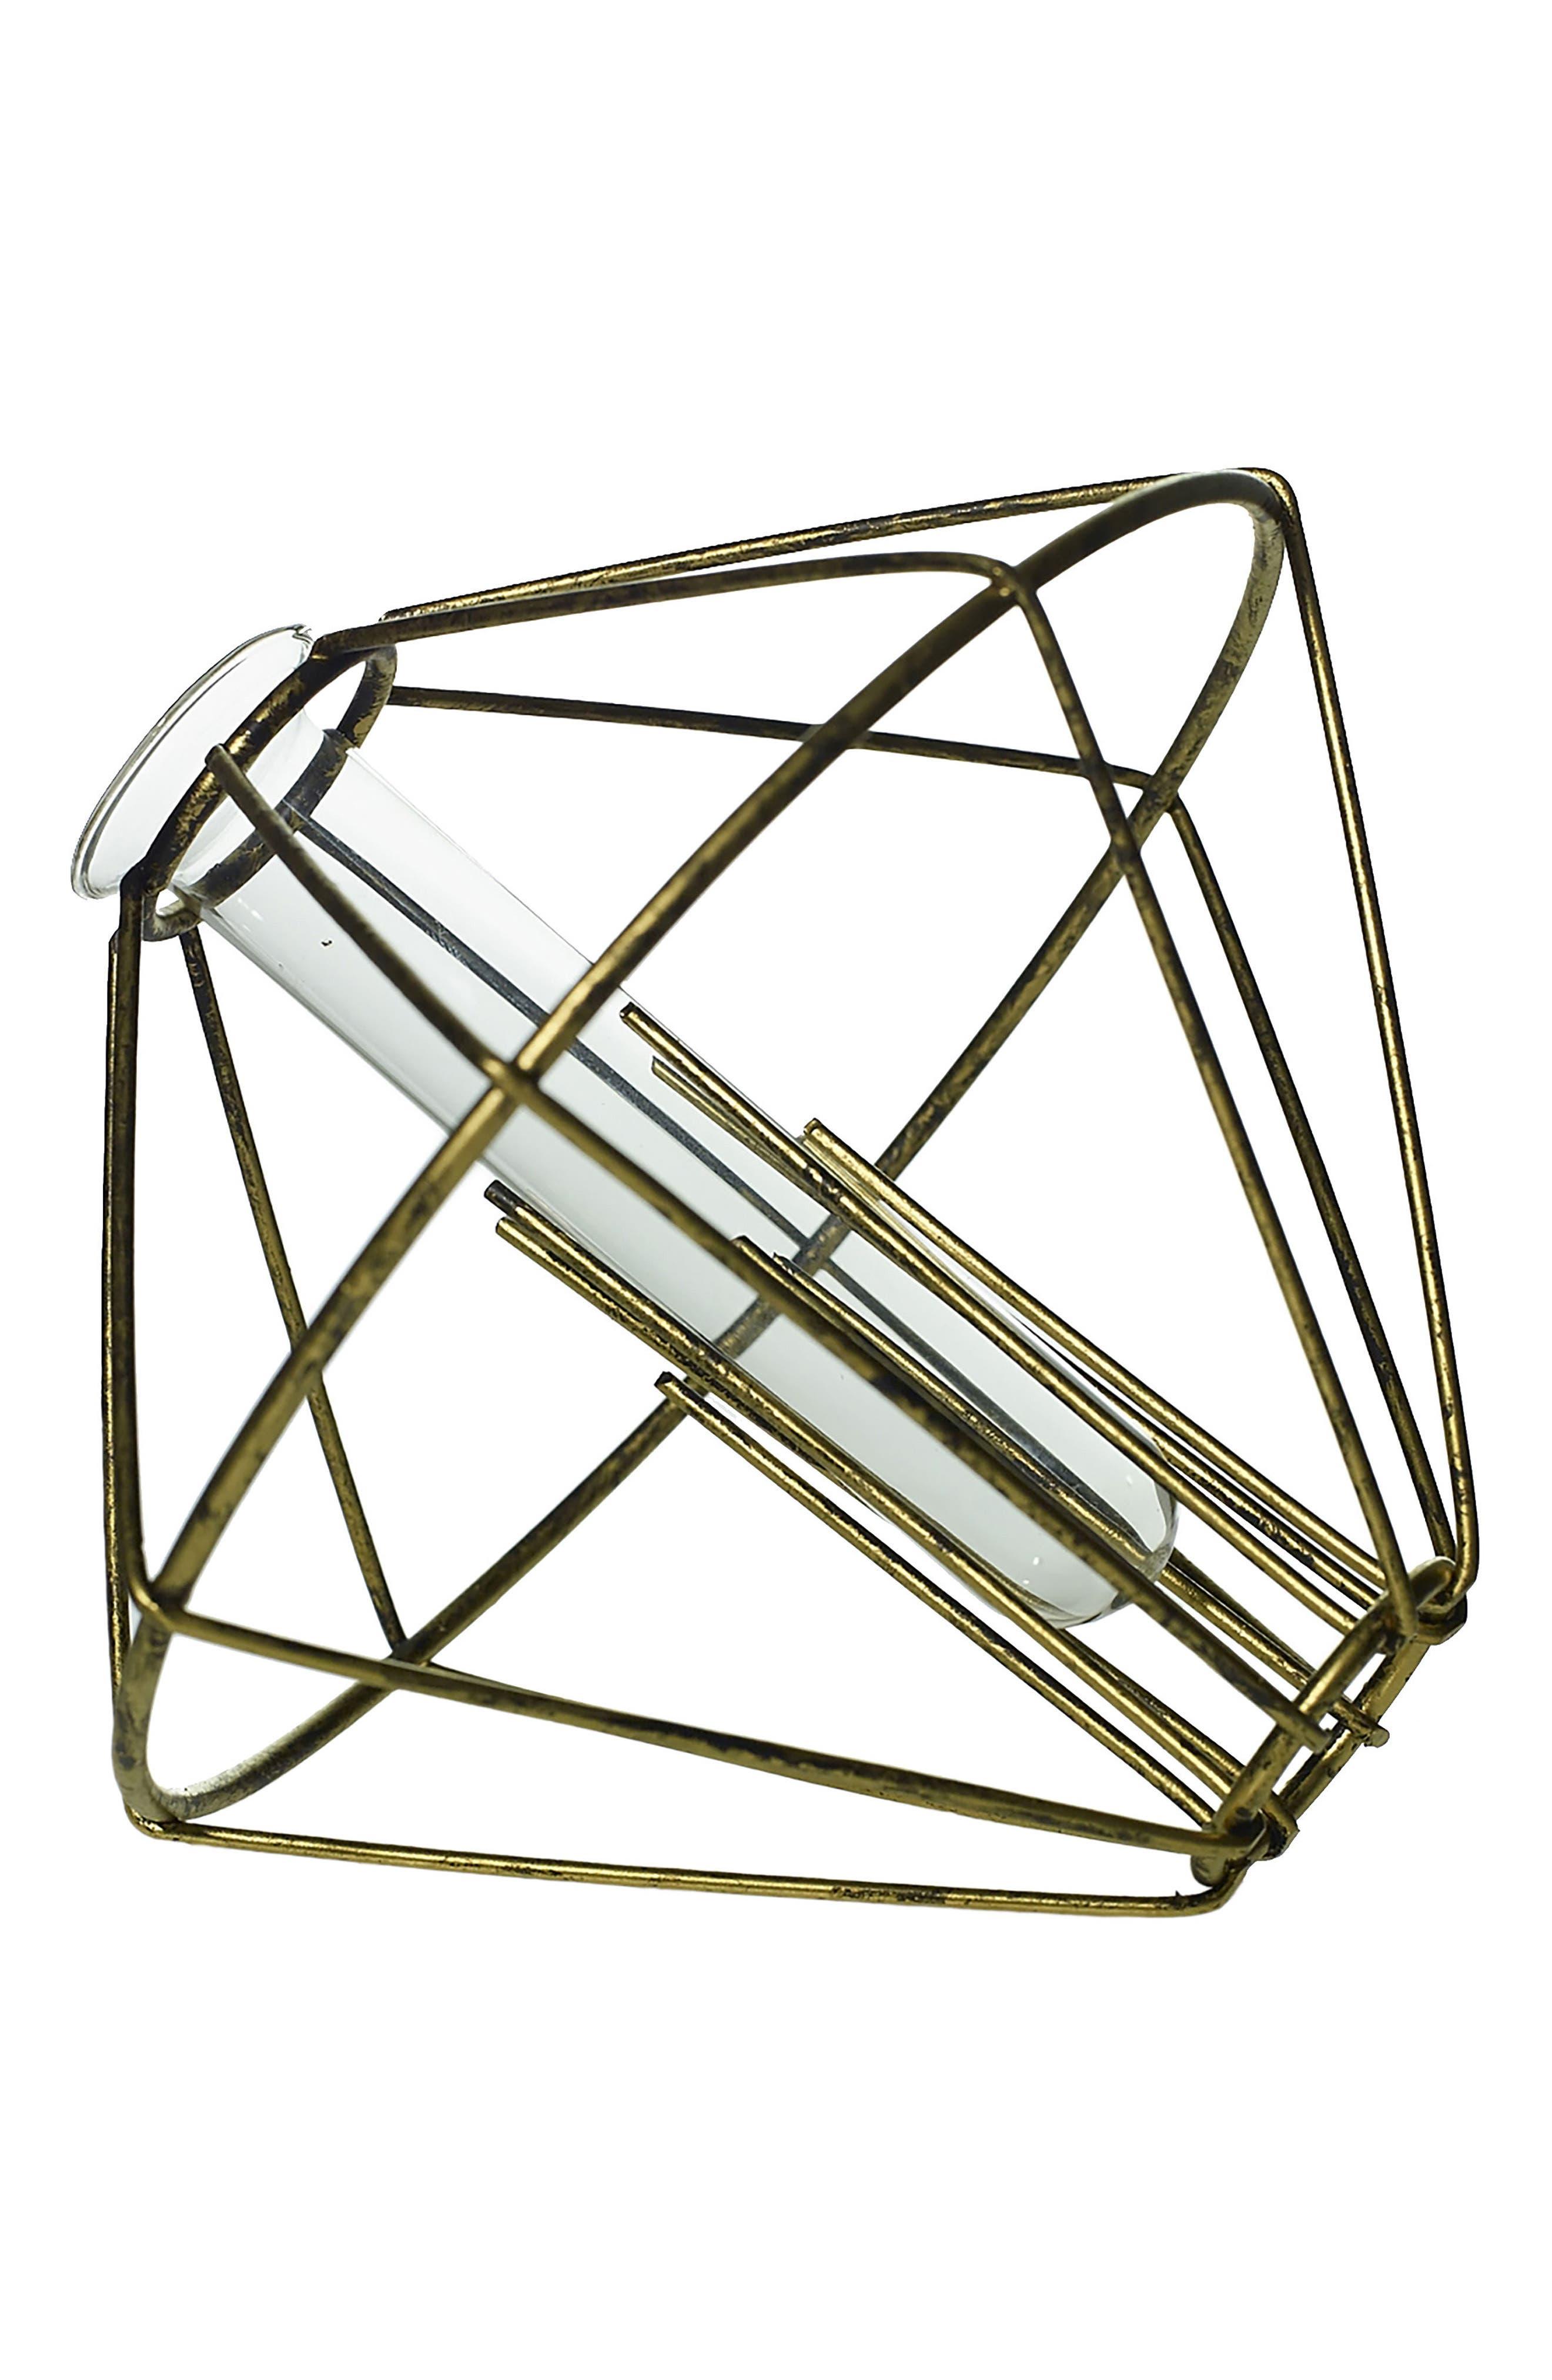 Main Image - Accent Decor Diamond Bud Vase